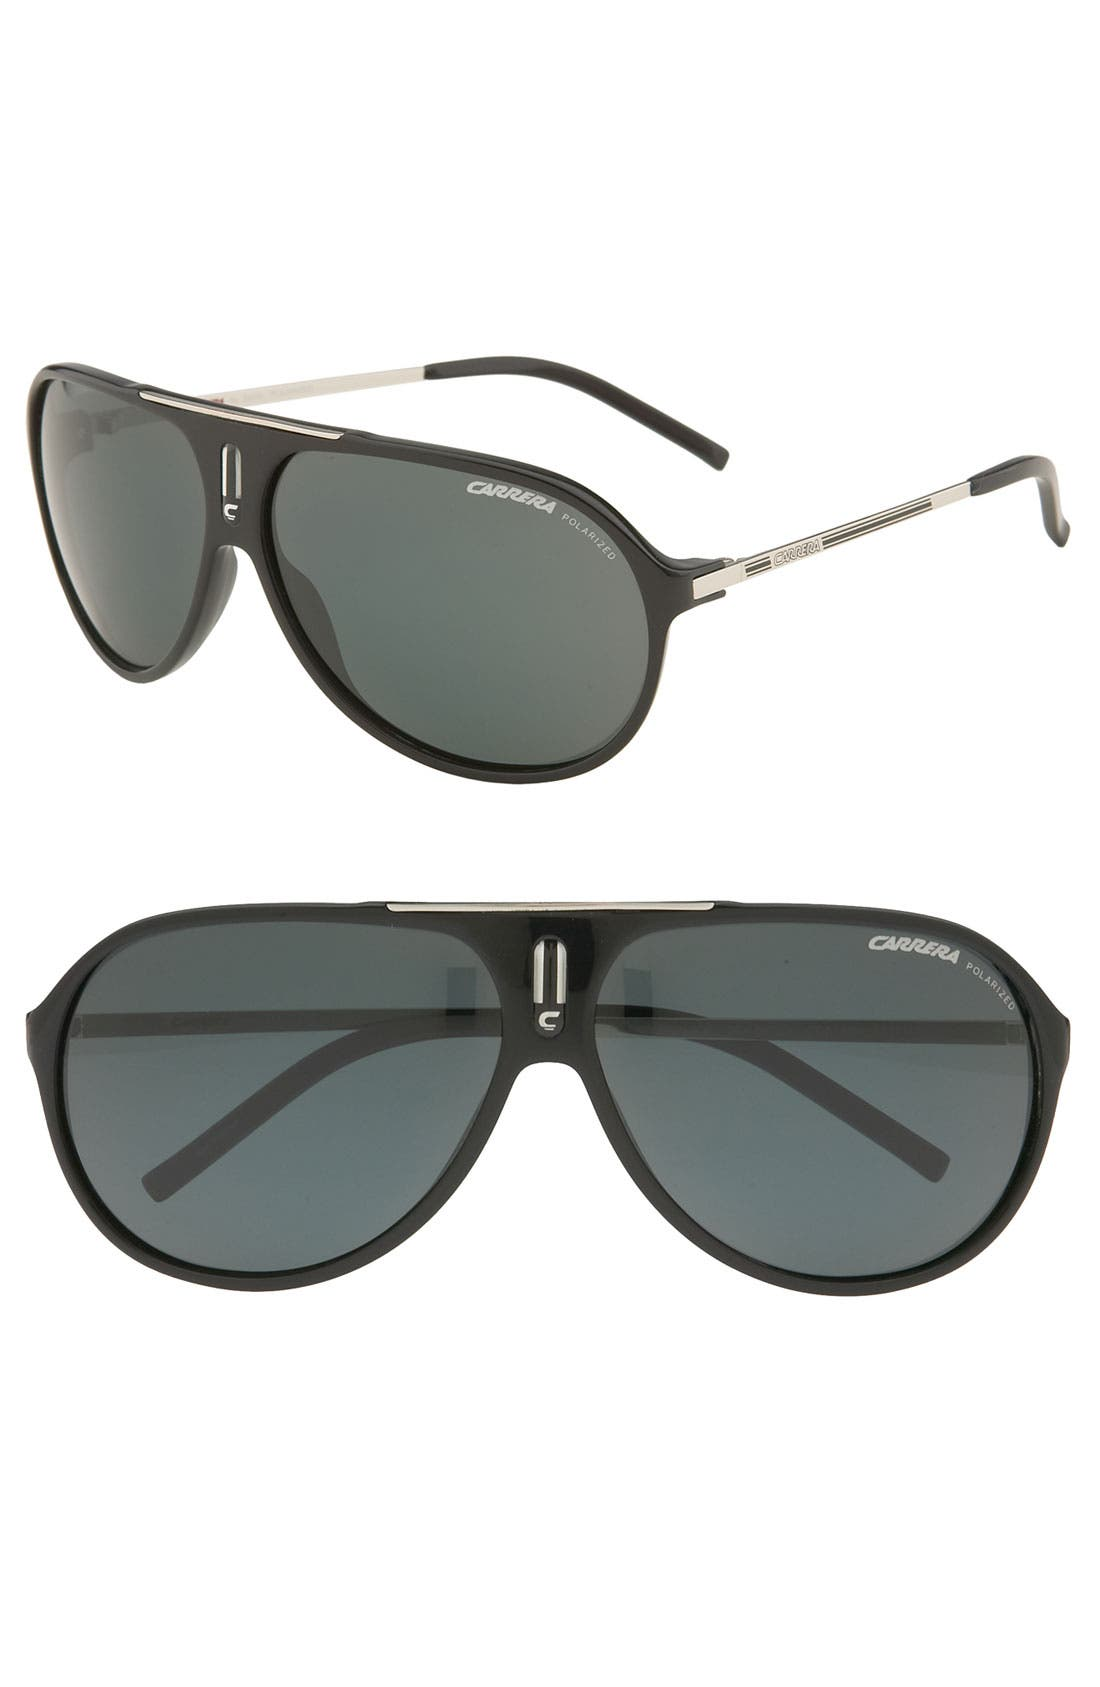 Alternate Image 1 Selected - Carrera Eyewear 'Hot' 64mm Polarized Vintage Inspired Aviator Sunglasses